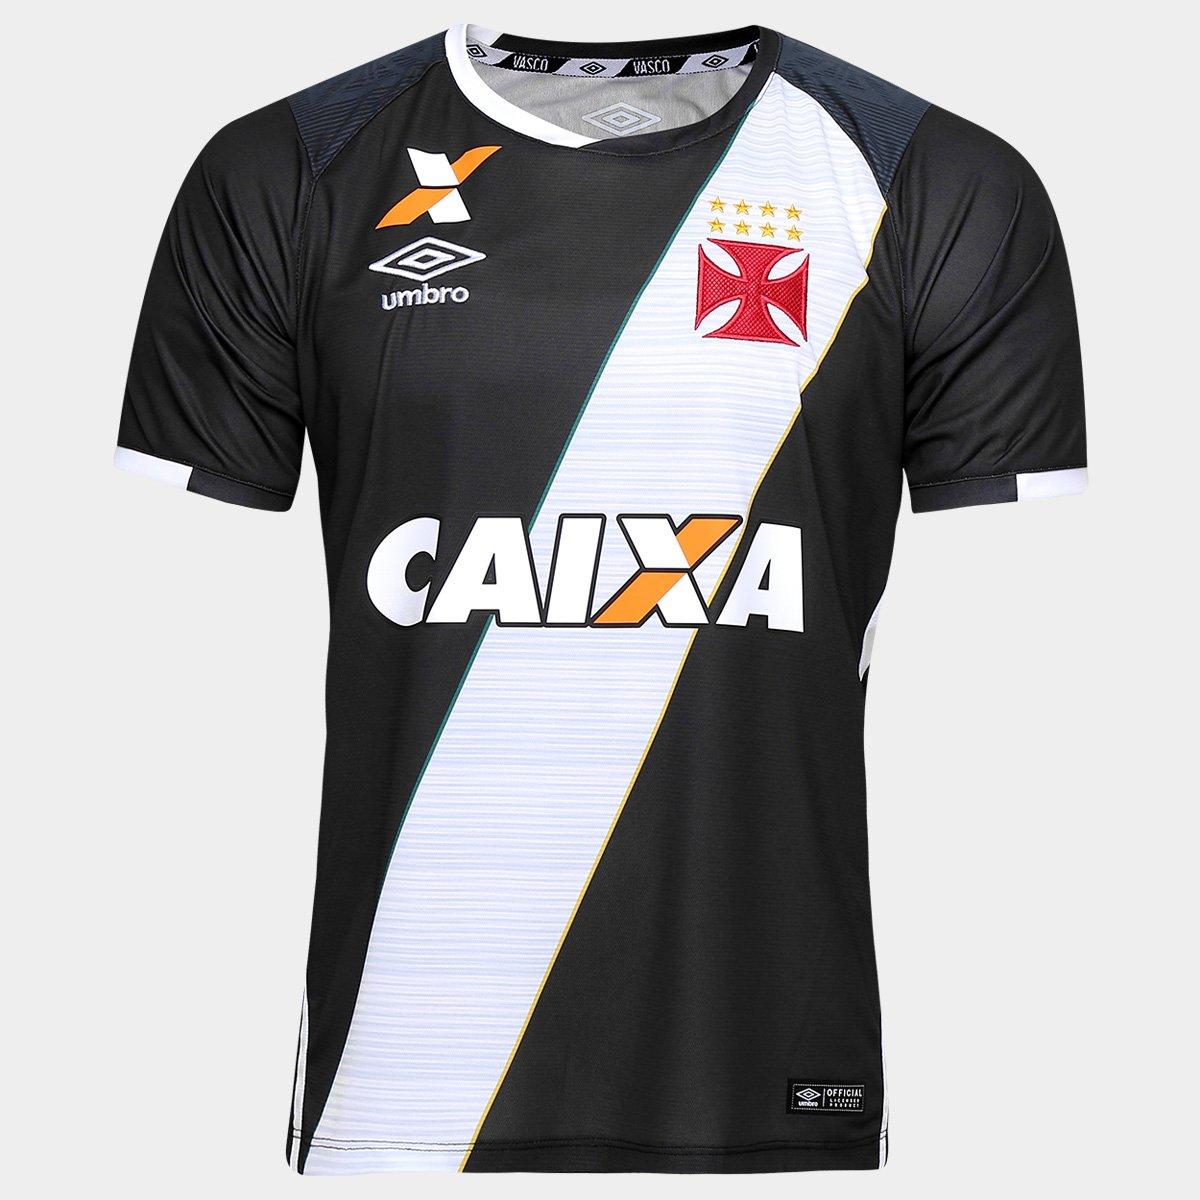 fb4b33b8389ba Camisa Vasco I 2016 nº 10 Torcedor Umbro Masculina - Compre Agora ...